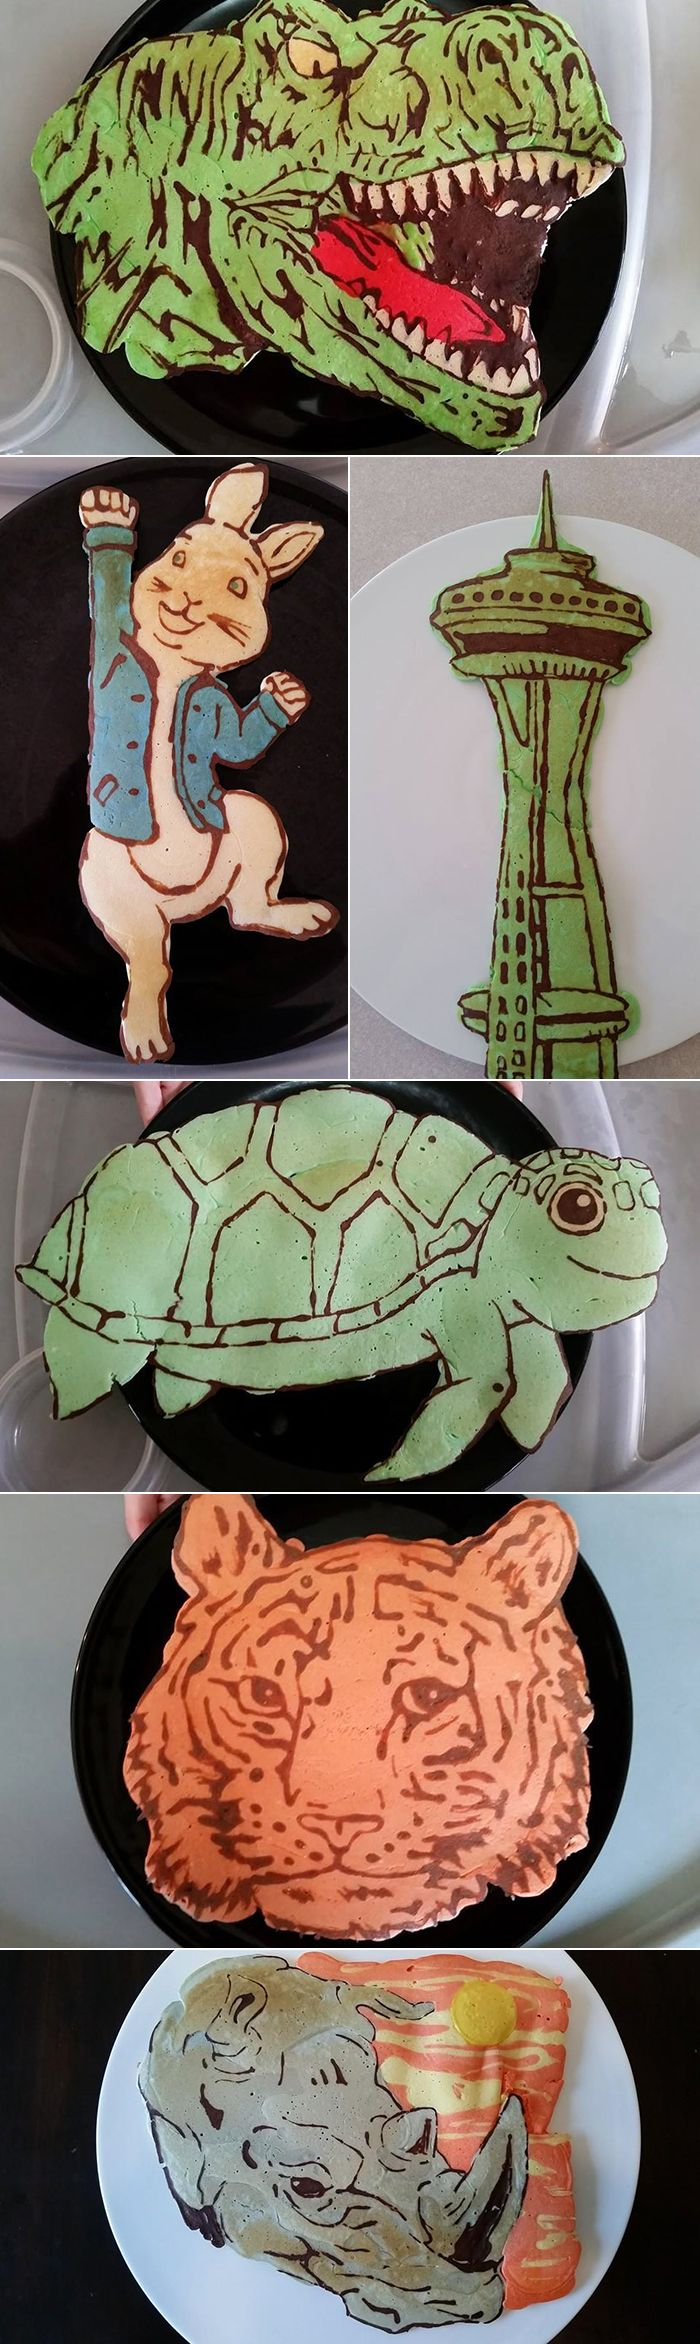 Amazing pancake art!